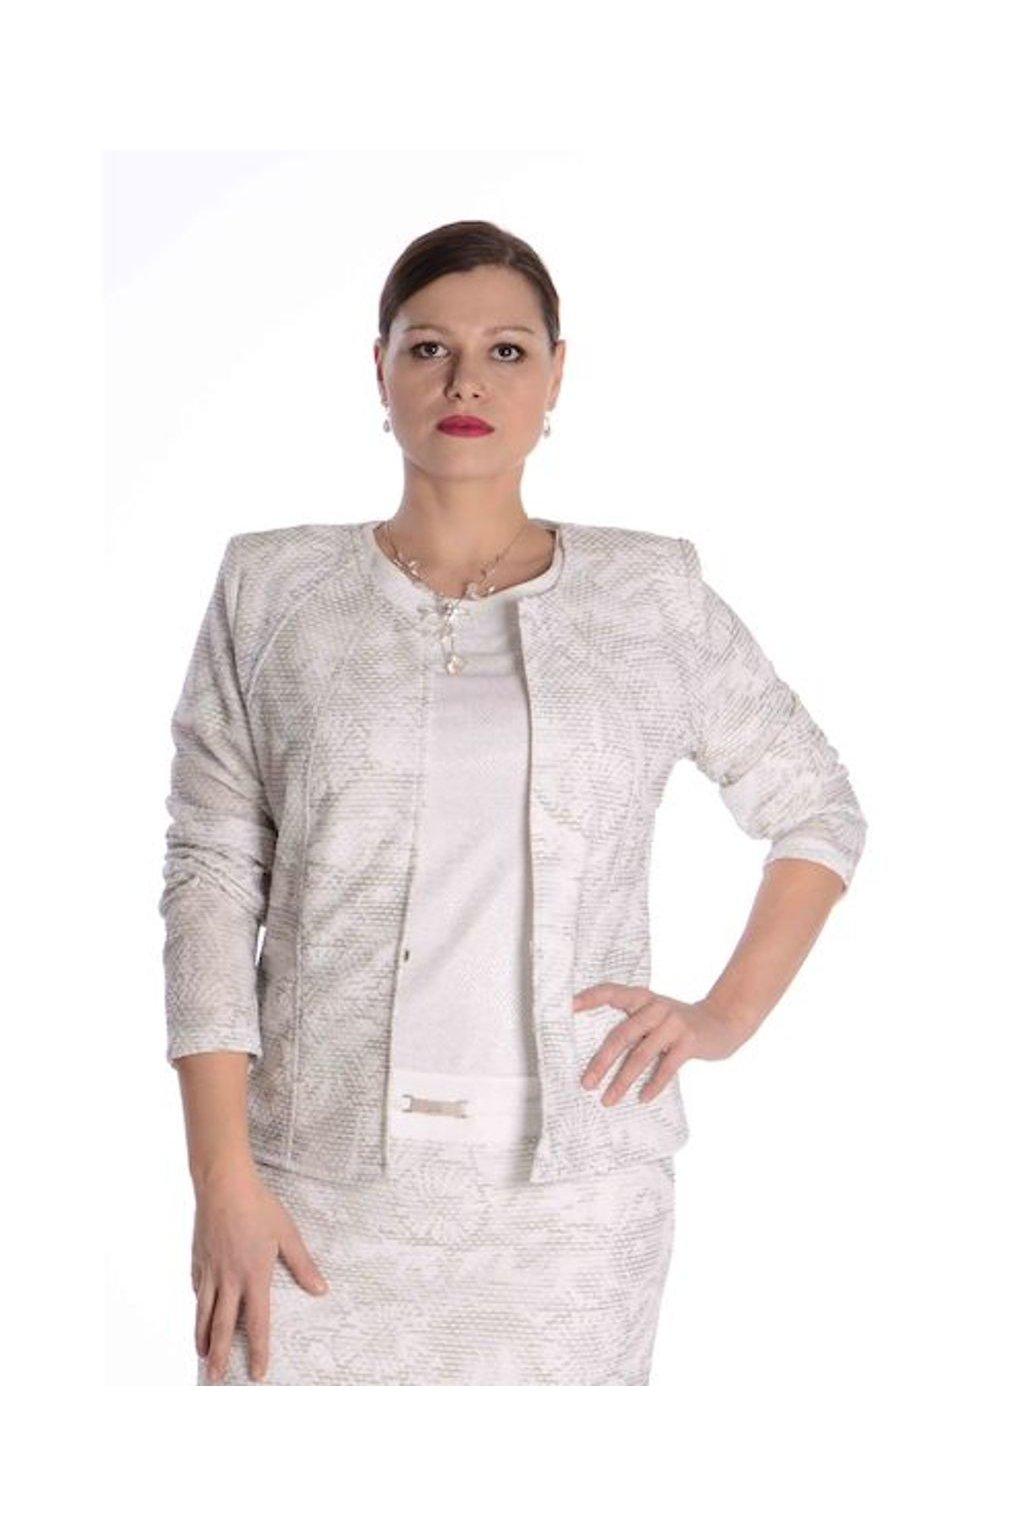 65T Kabátek Charisma (Velikost 36, Barva Vzorovaná)